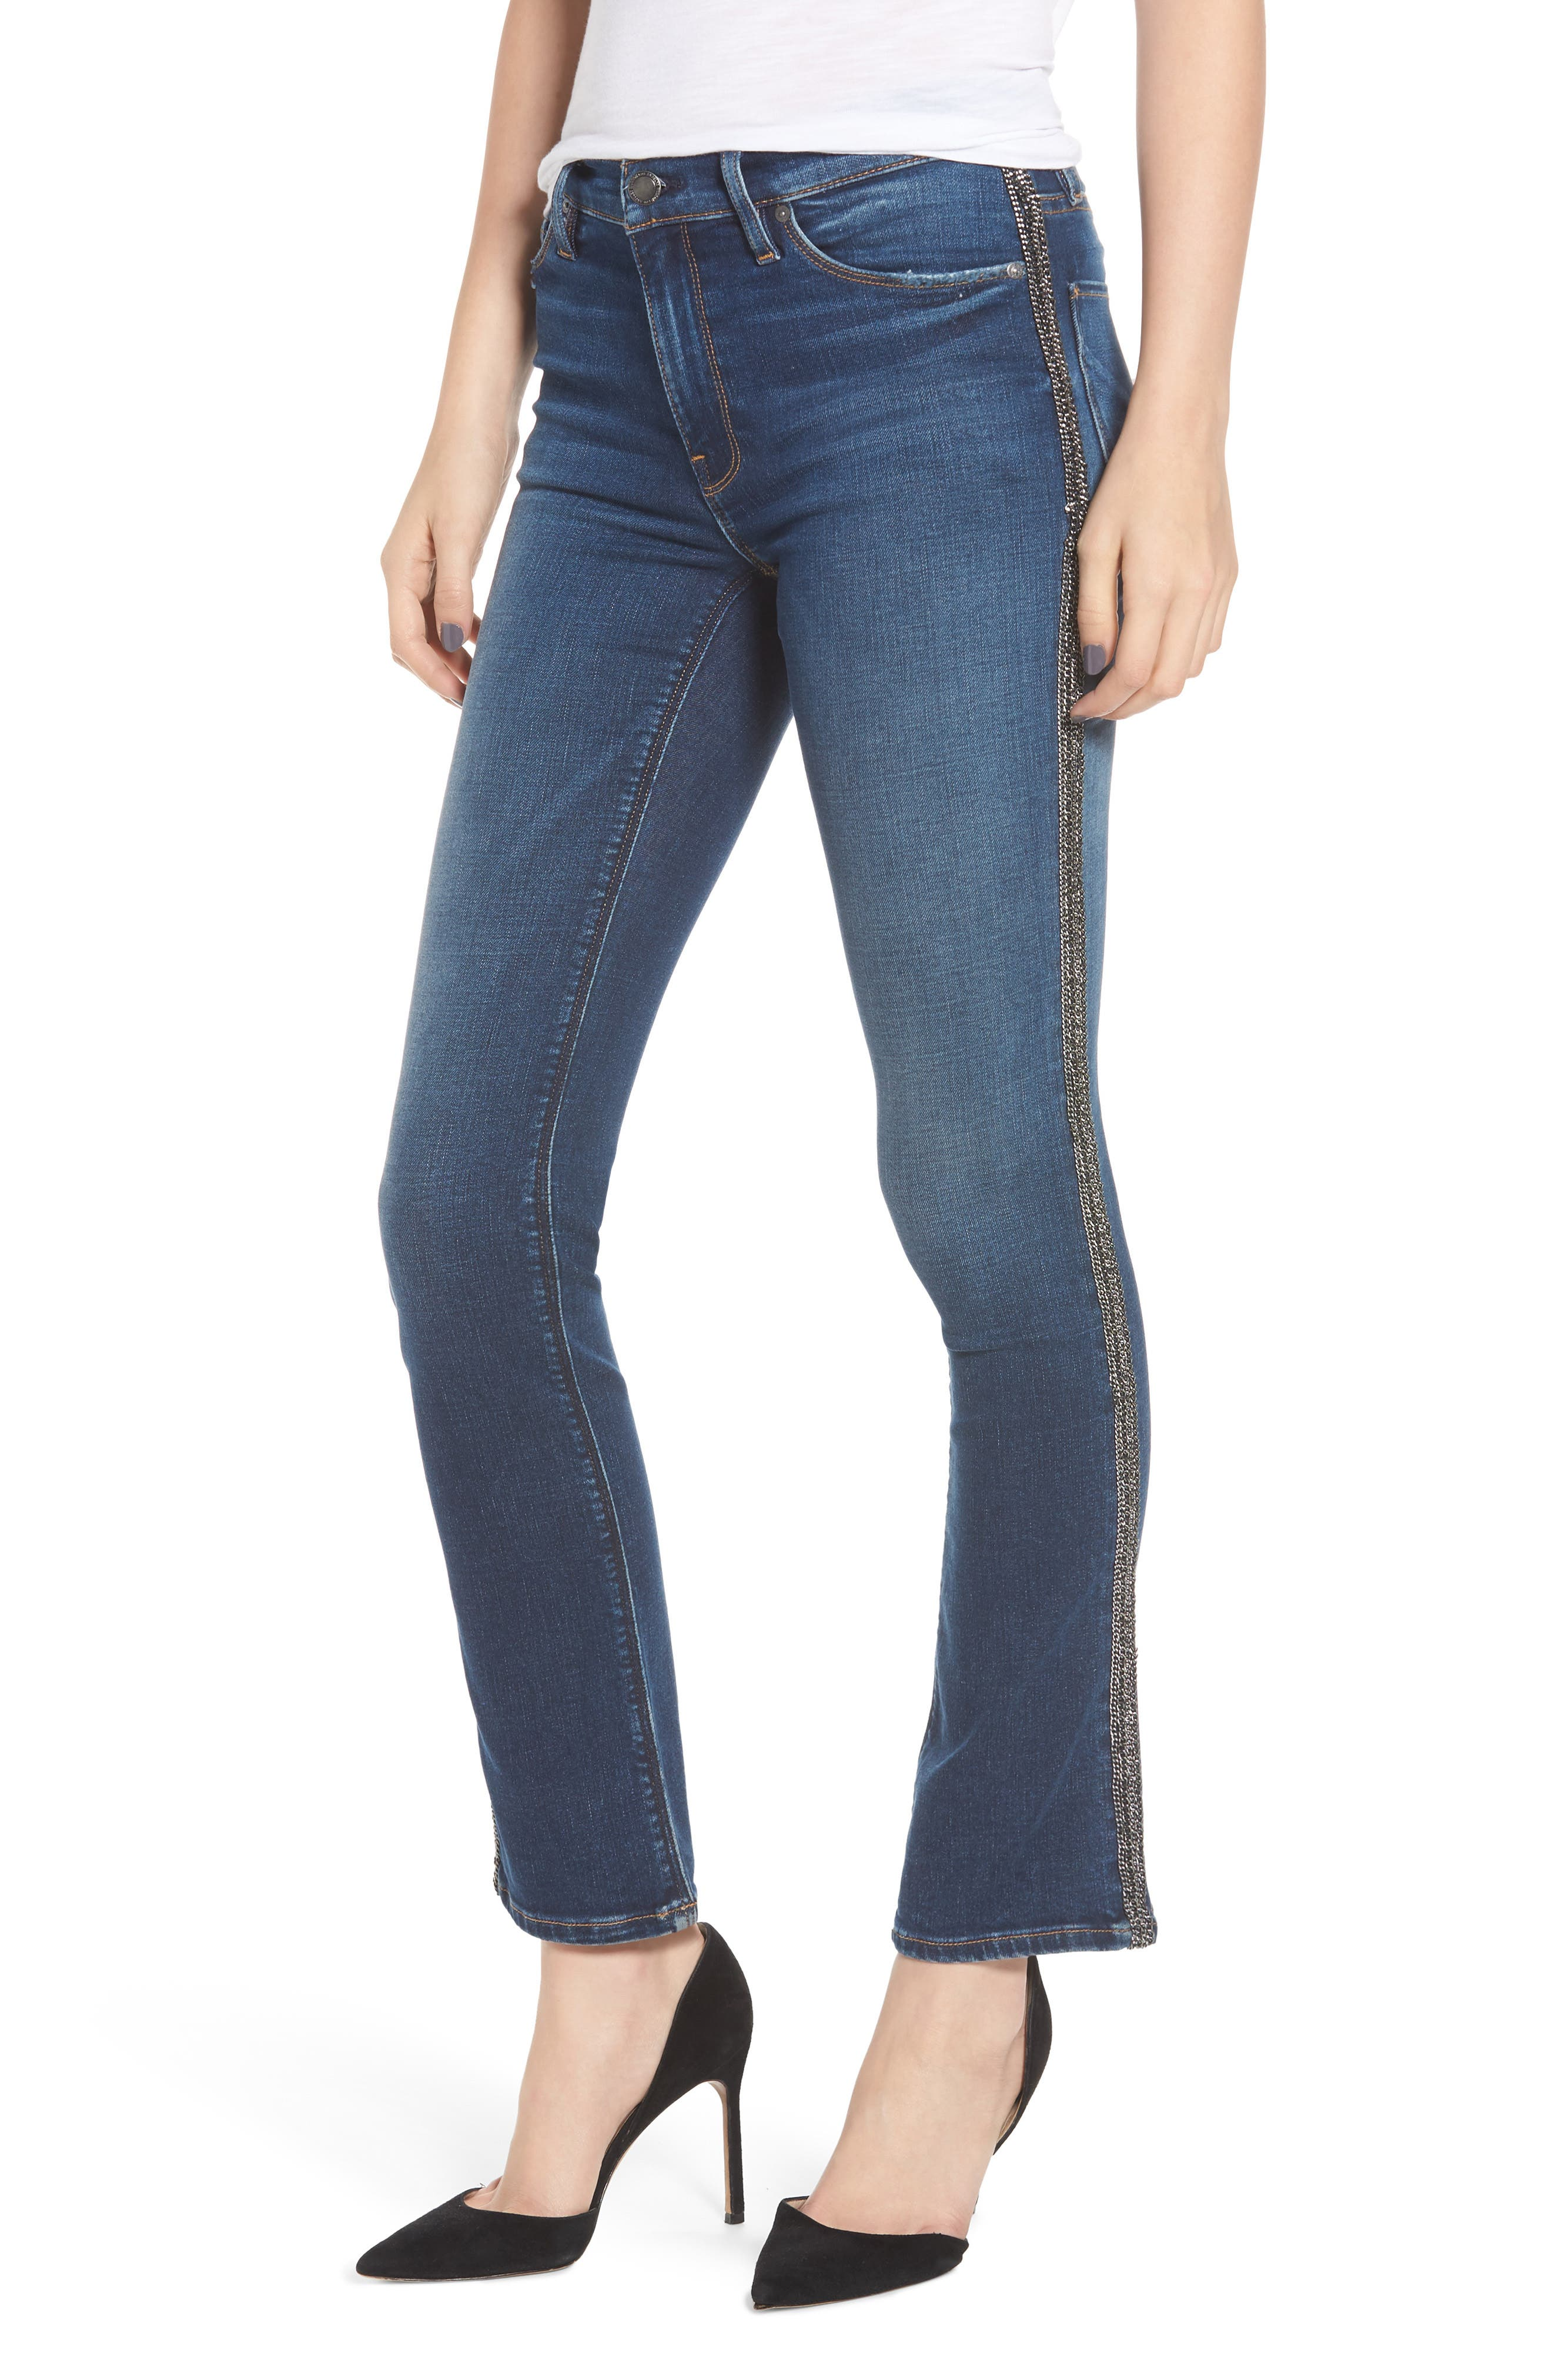 HUDSON Nico Mid-Rise Cigarette Jeans With Metallic Stripes in Utopia